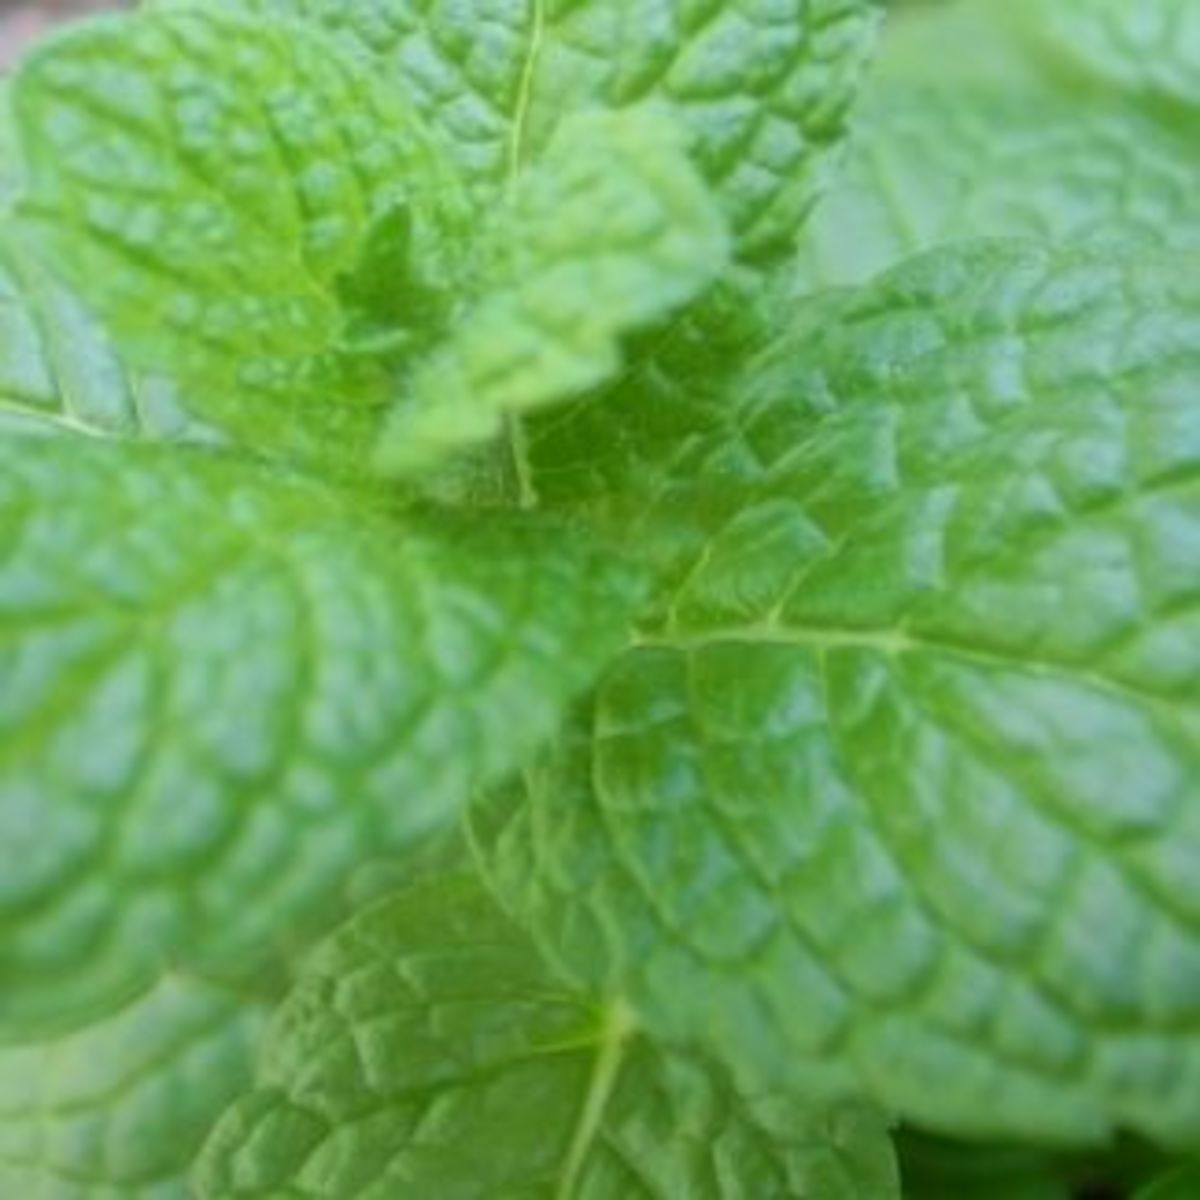 Can Mint Tea Heal?